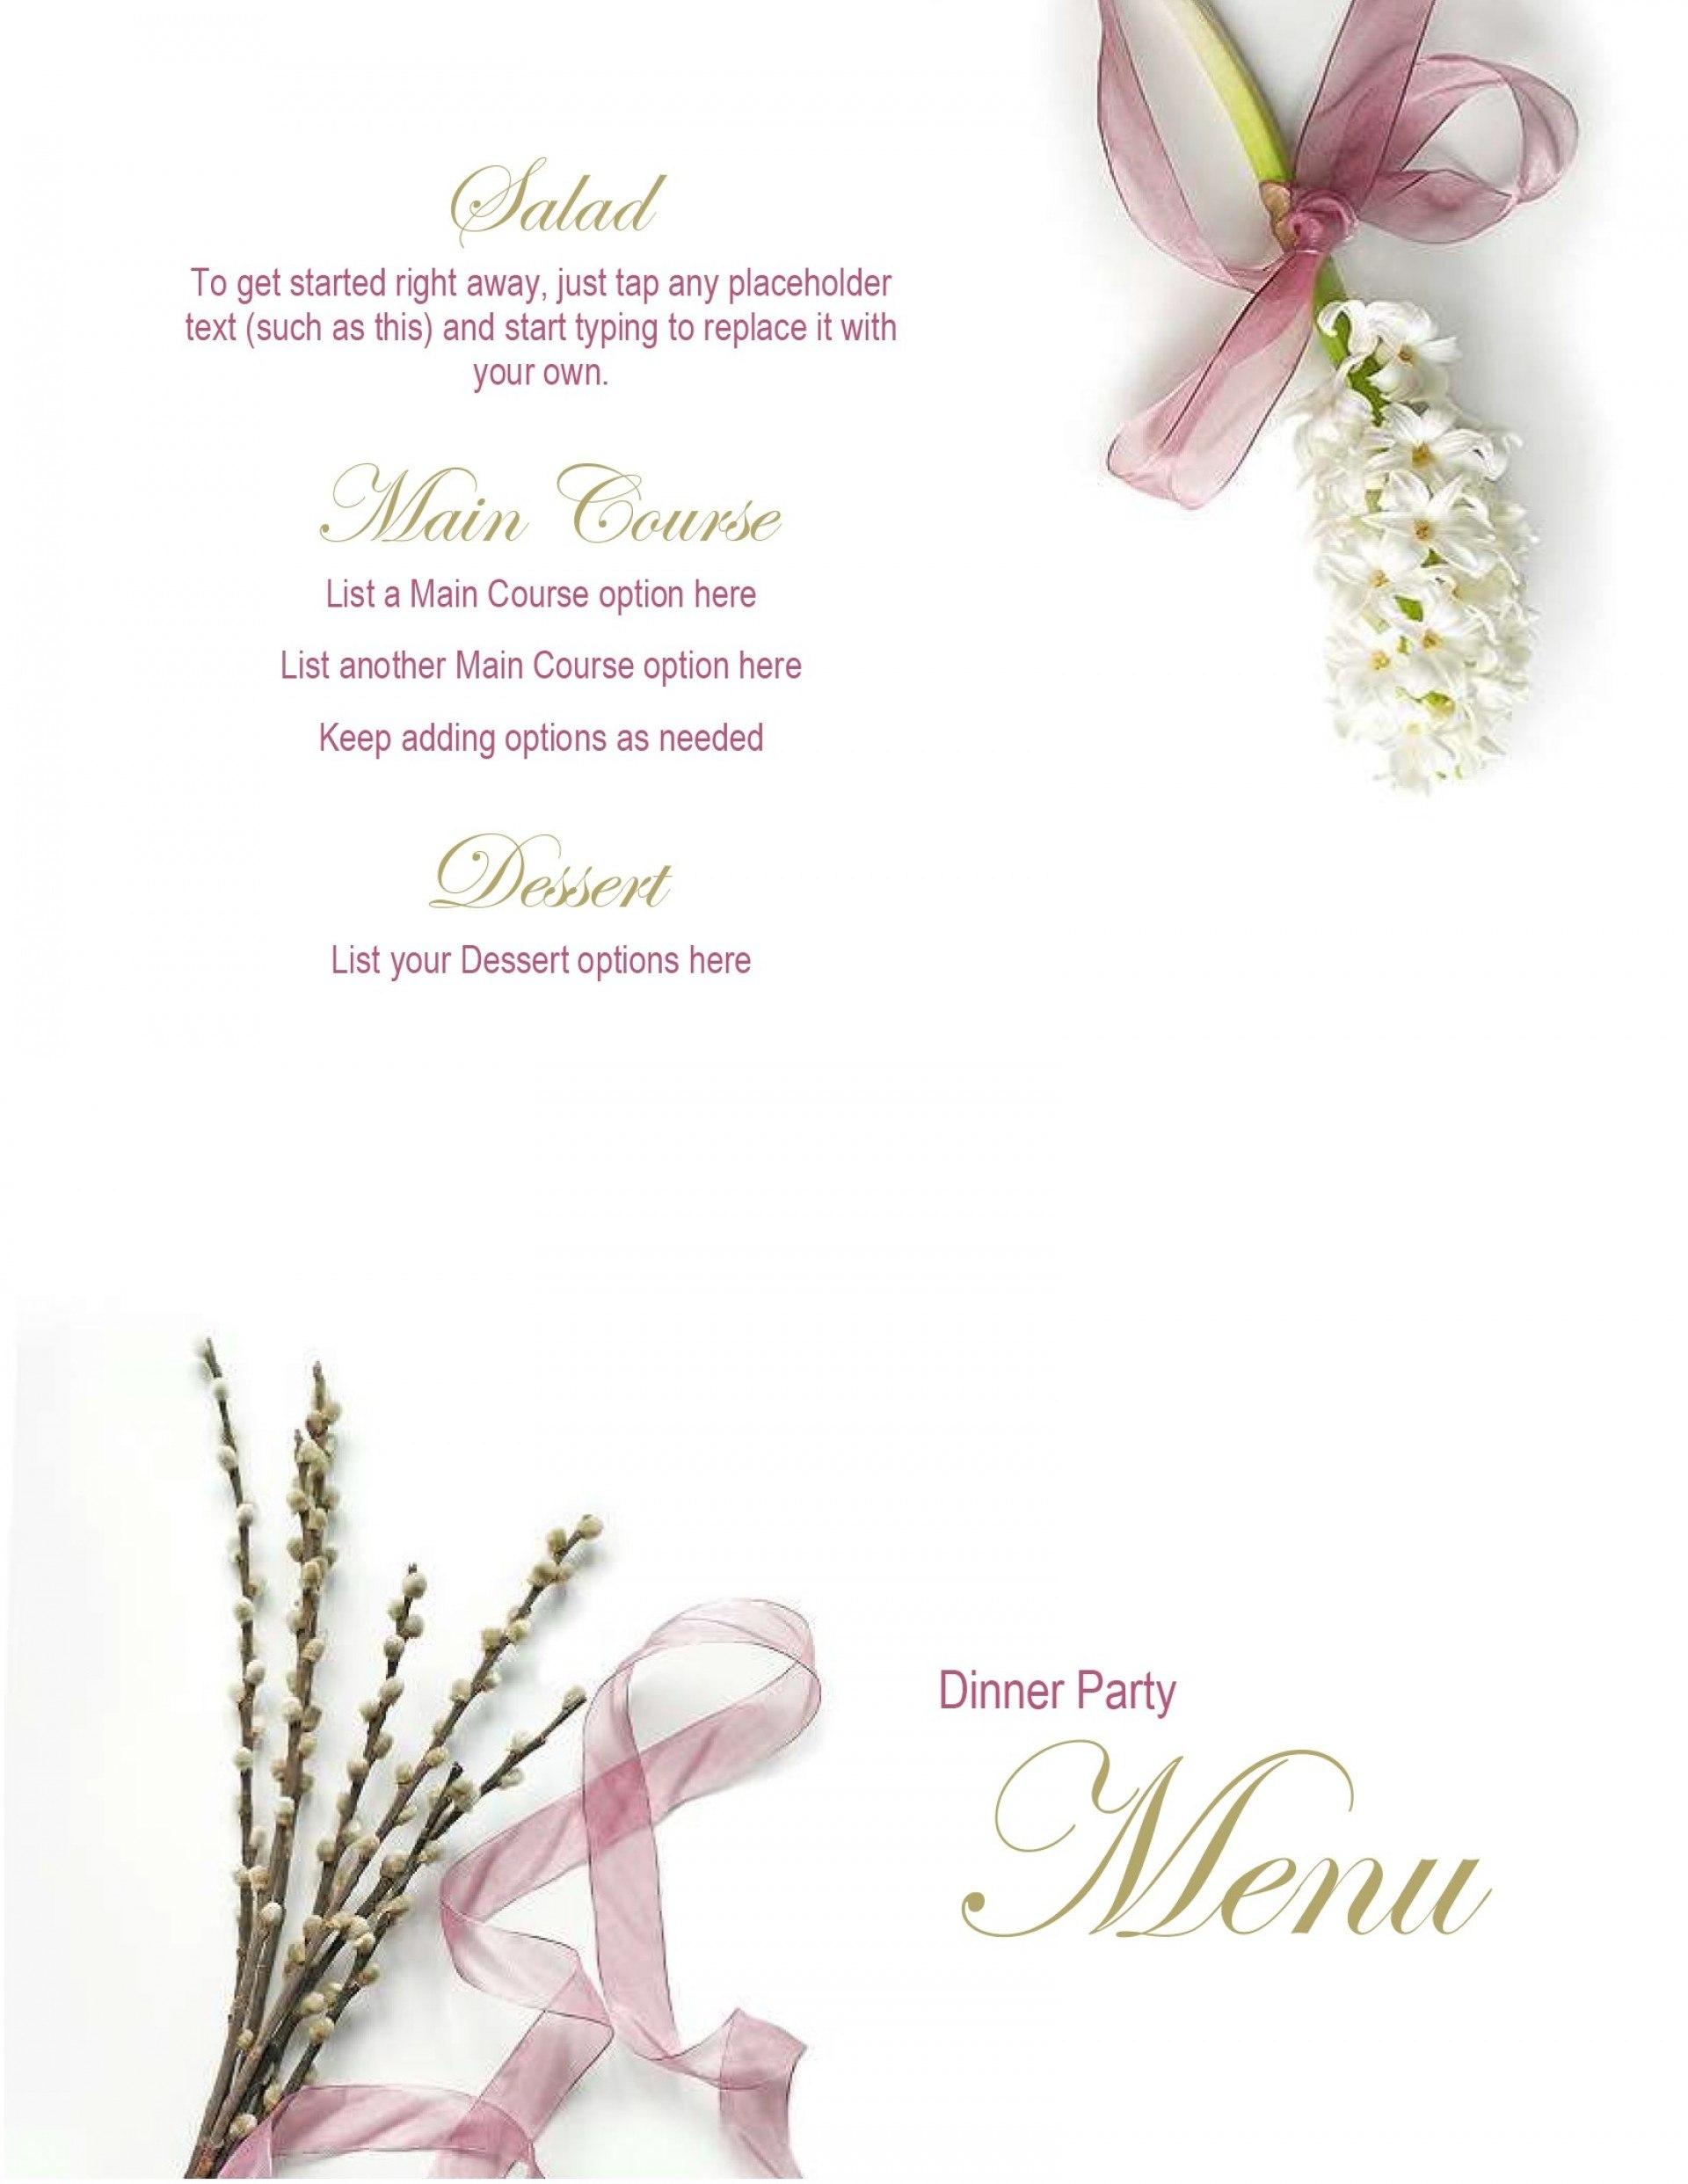 Printable Word Menu Template Imposing Free Templates Regarding Free Printable Menu Templates For Wedding